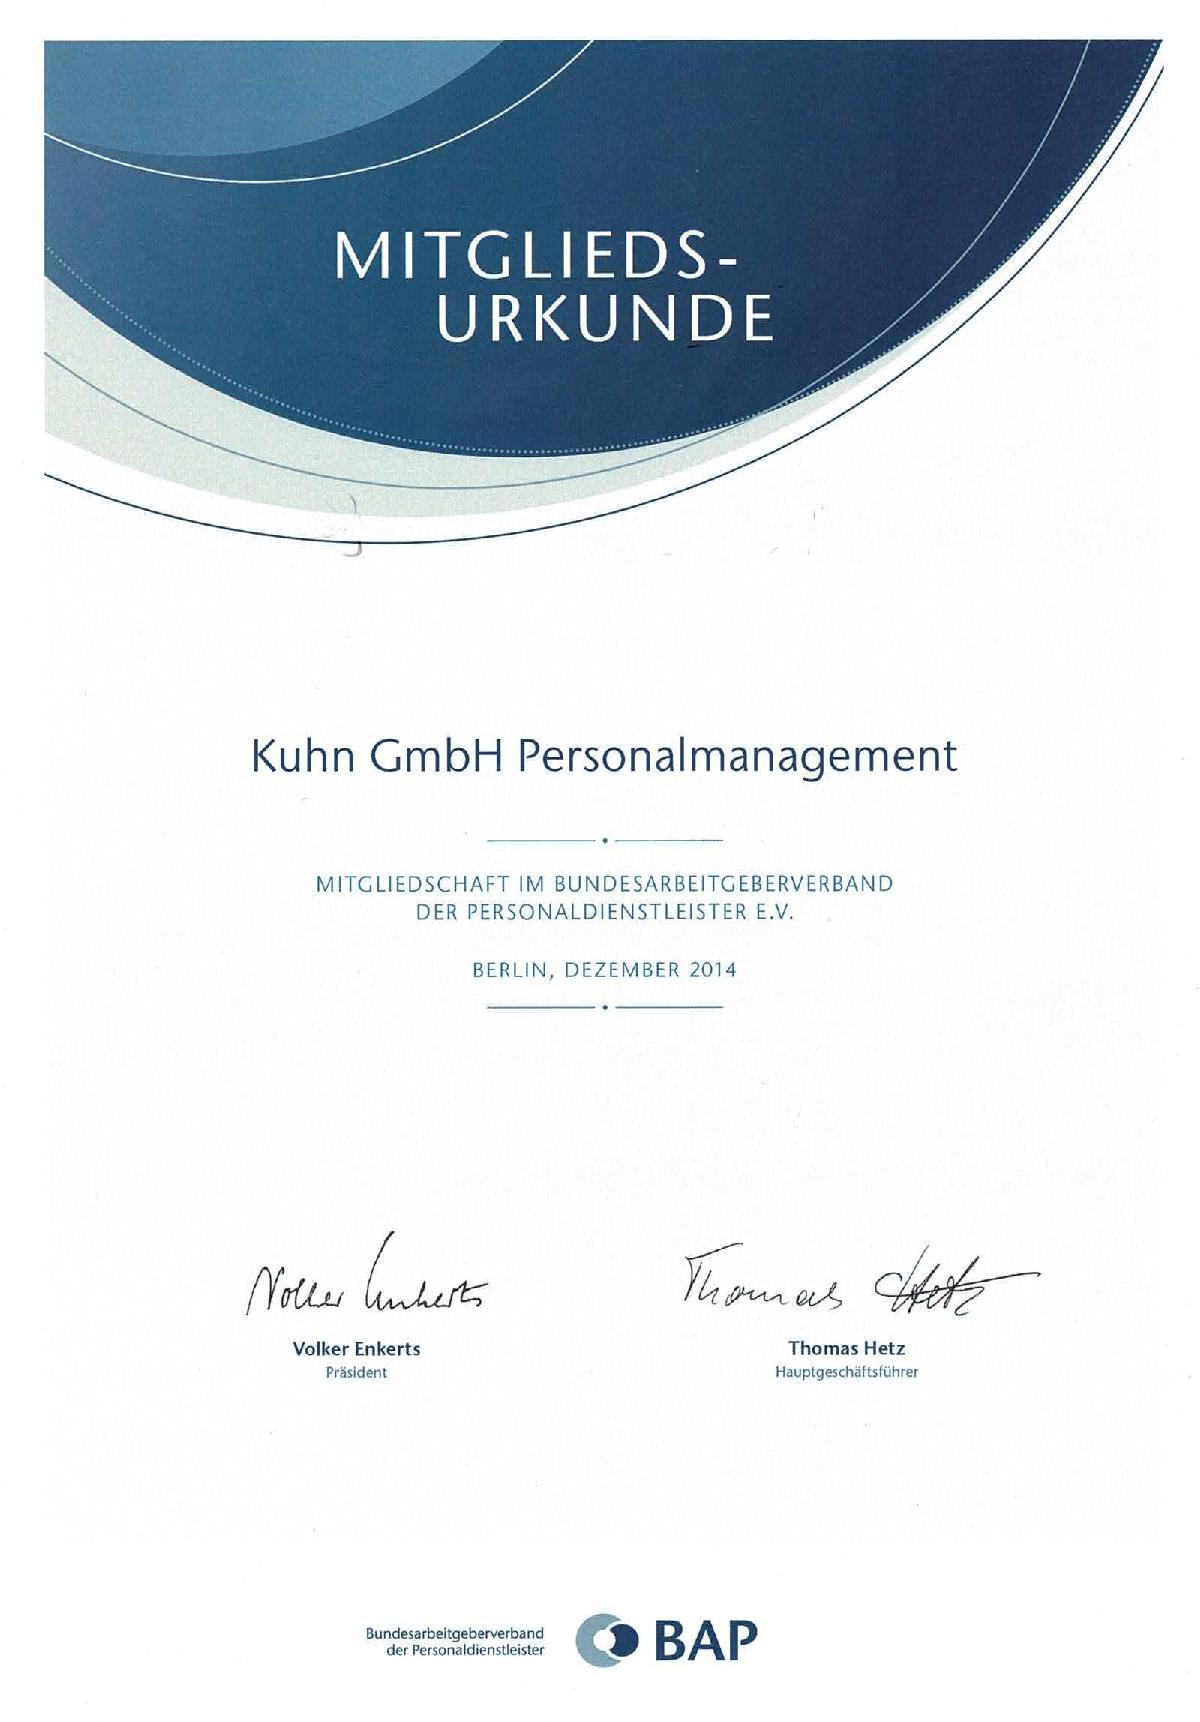 Mitgliedsurkunde Kuhn